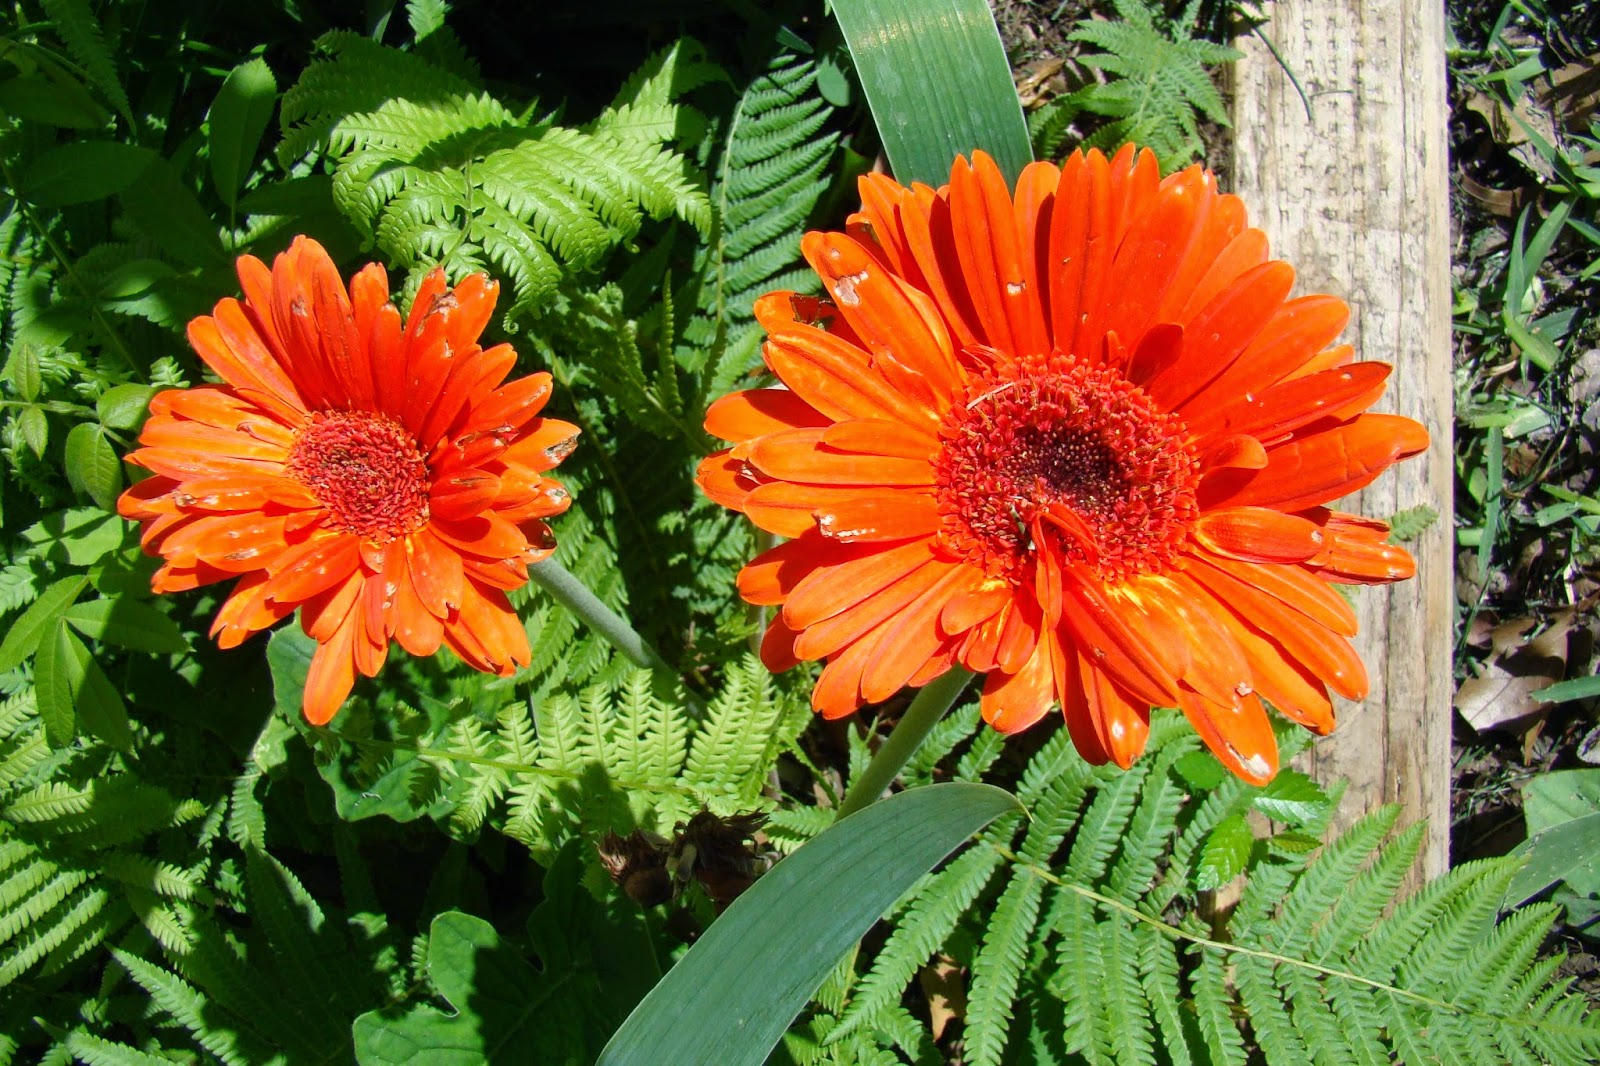 Orange gerbera daisies with imperfect petals